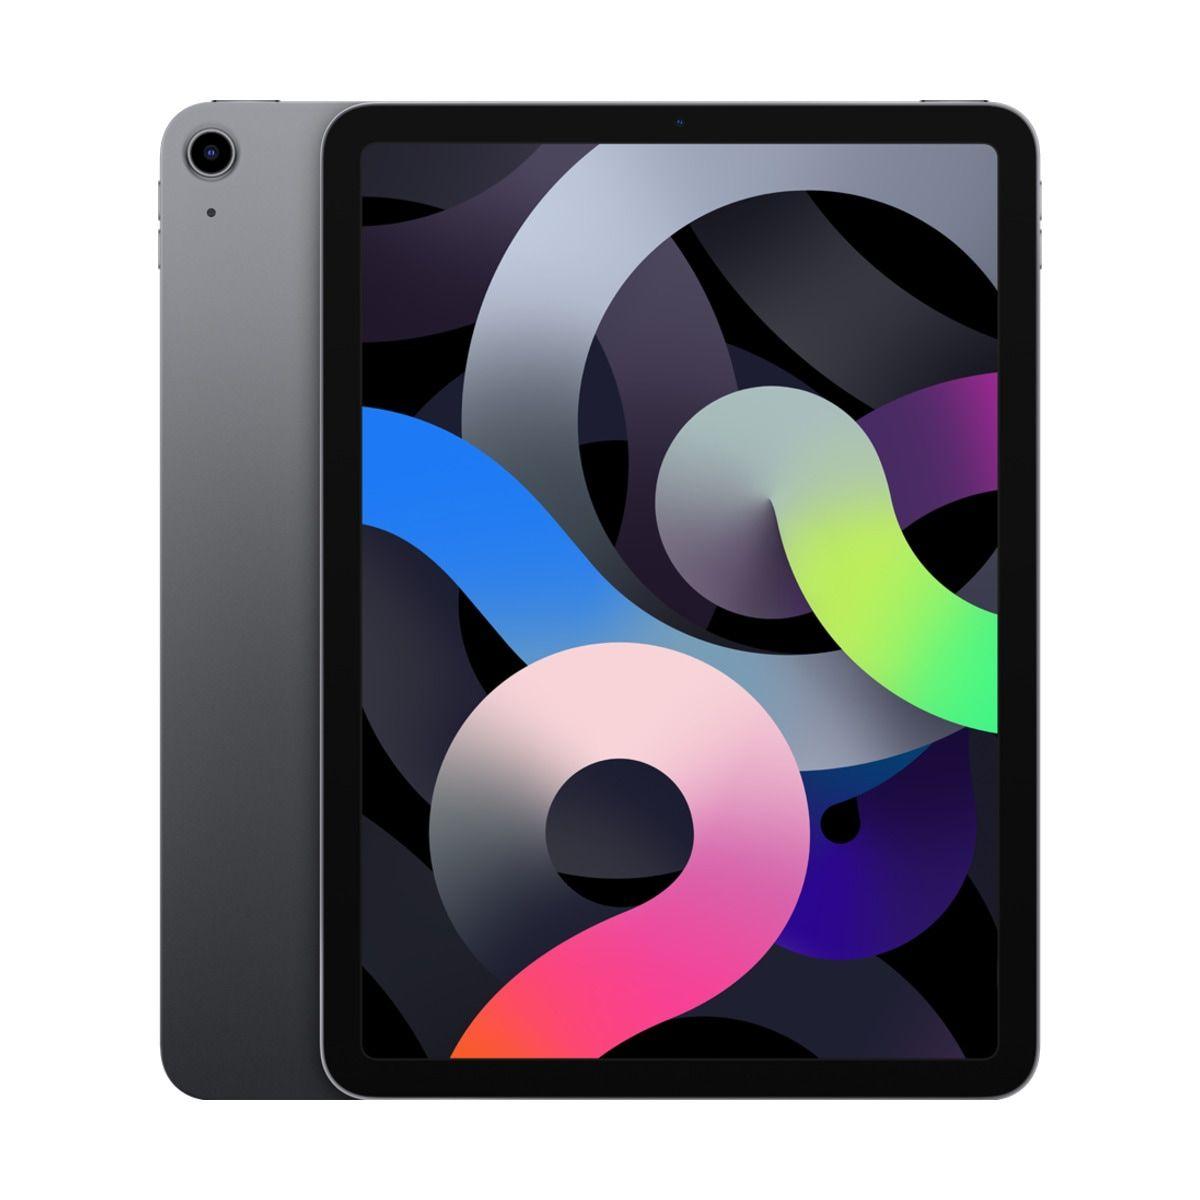 Apple iPad Air Wi-Fi 64GB - Space Grey / SK